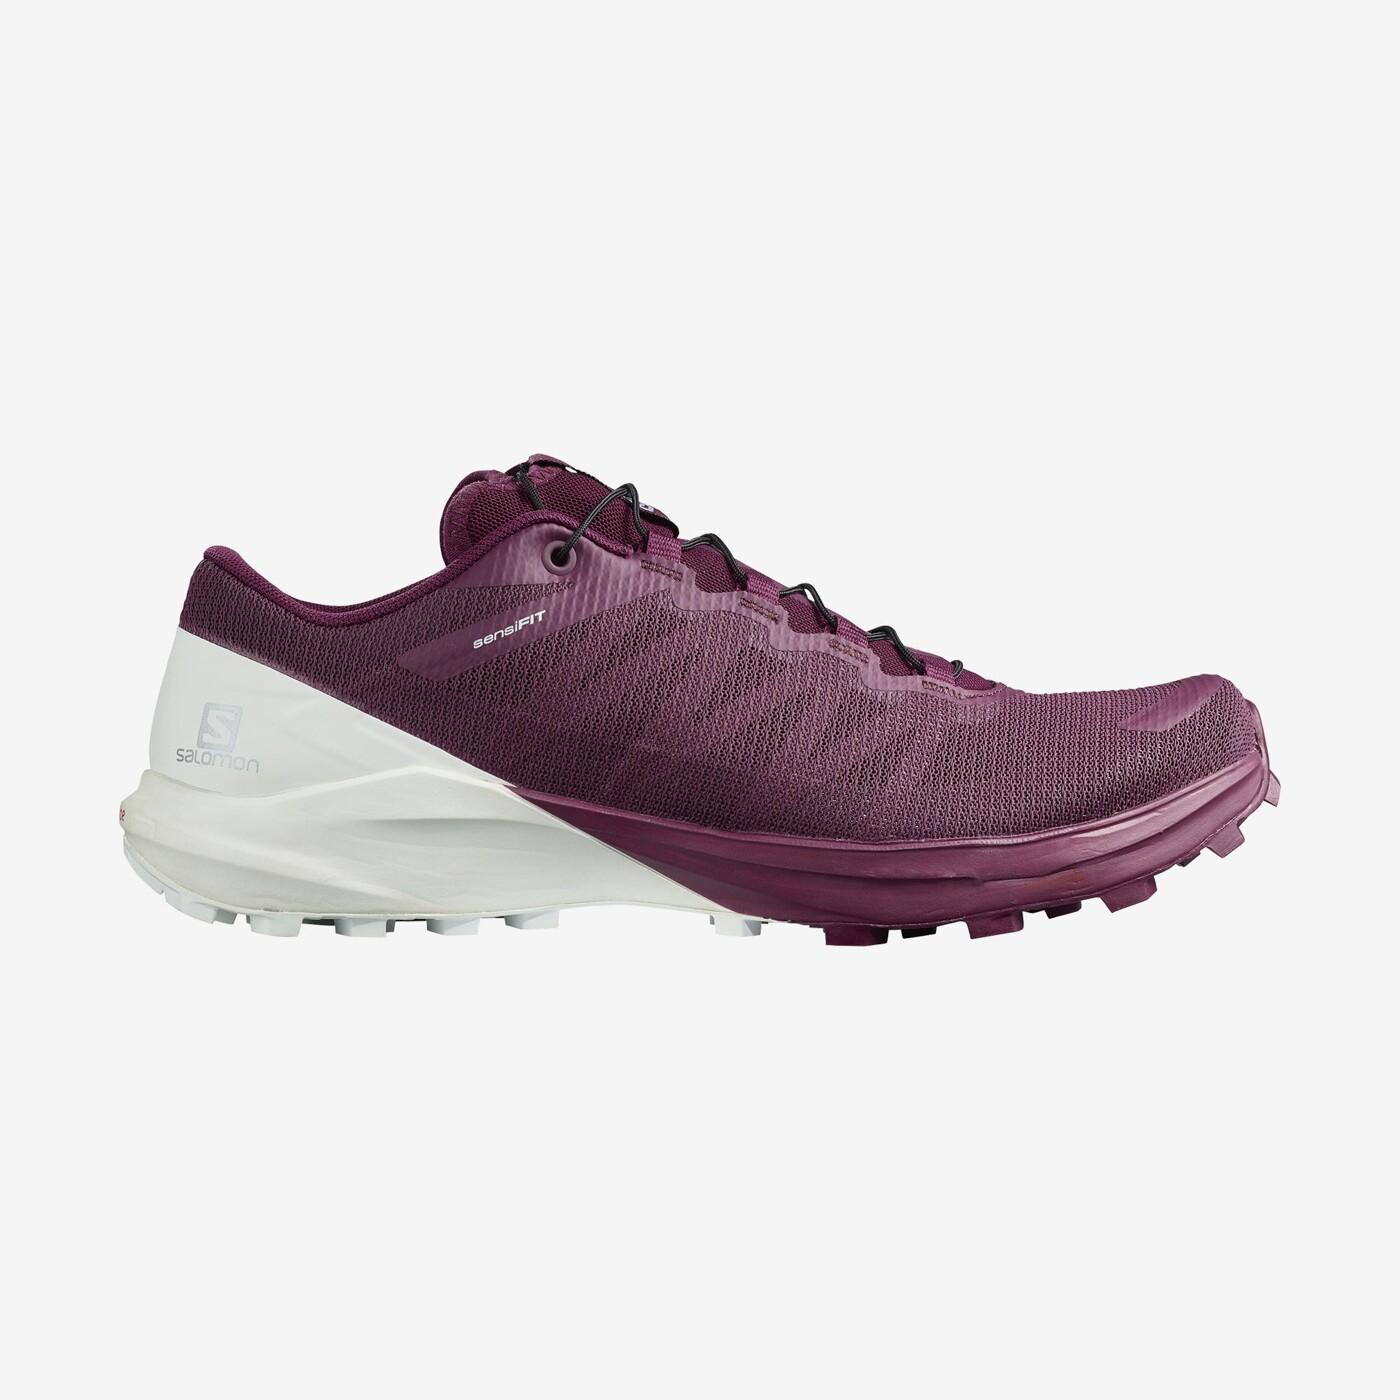 SALOMON SENSE PRO 4 - Trailrunning-Schuhe - Damen